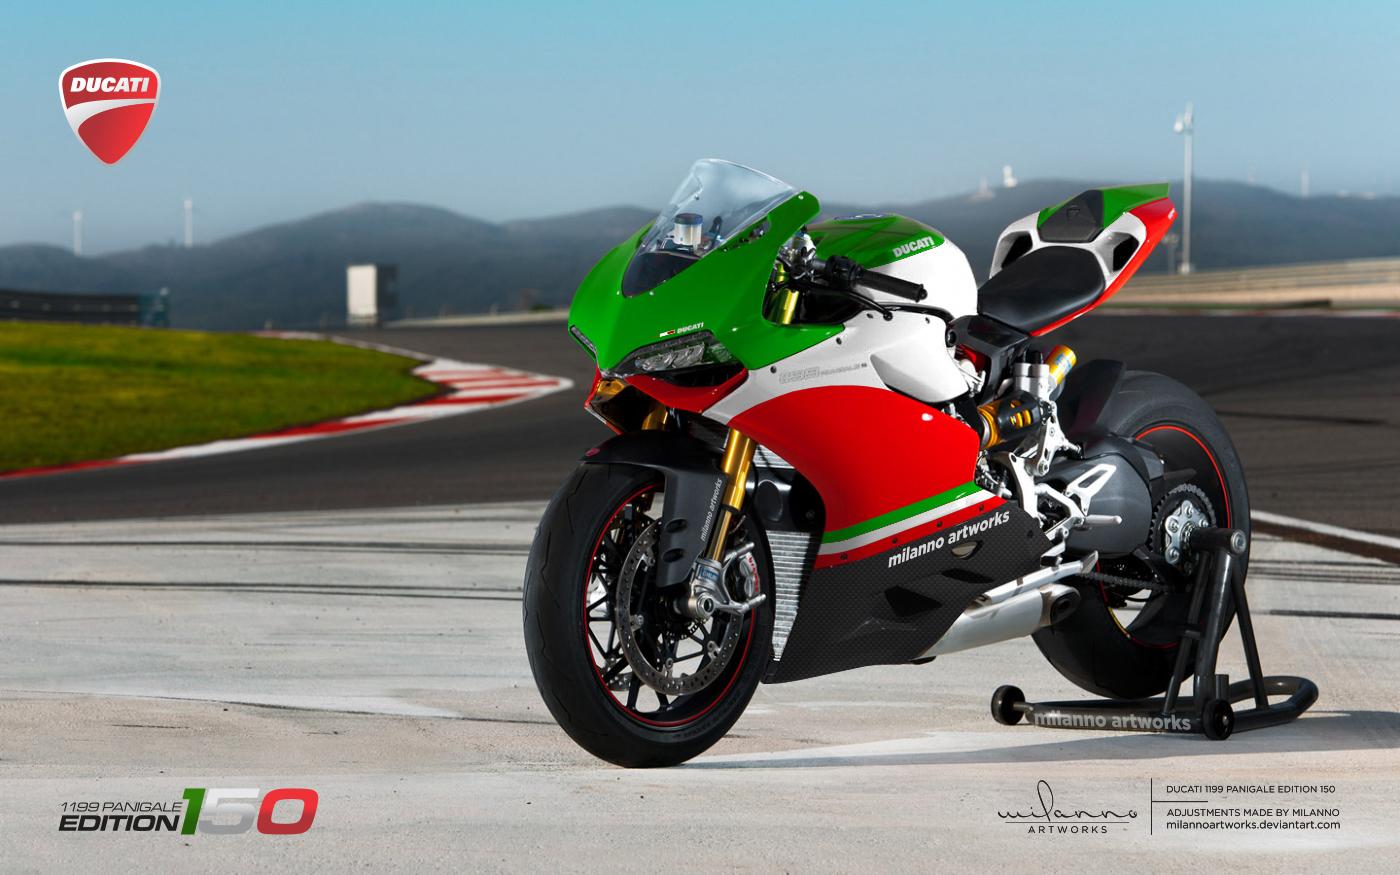 2016 Ducati 1199 Wallpapers 1400x875